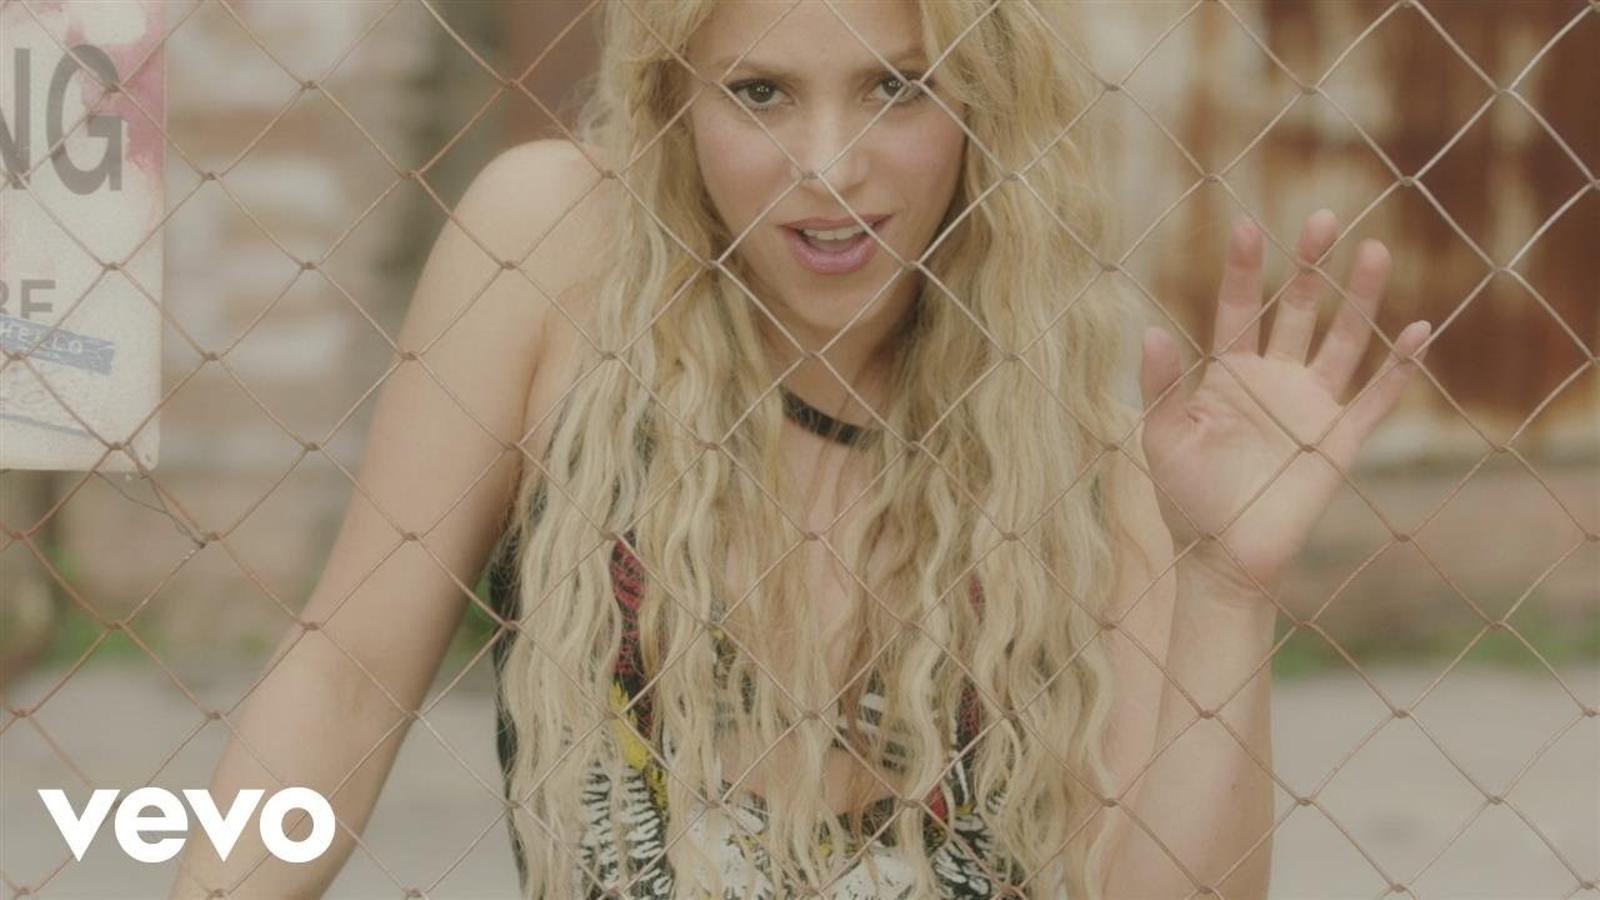 'Me enamoré', de Shakira